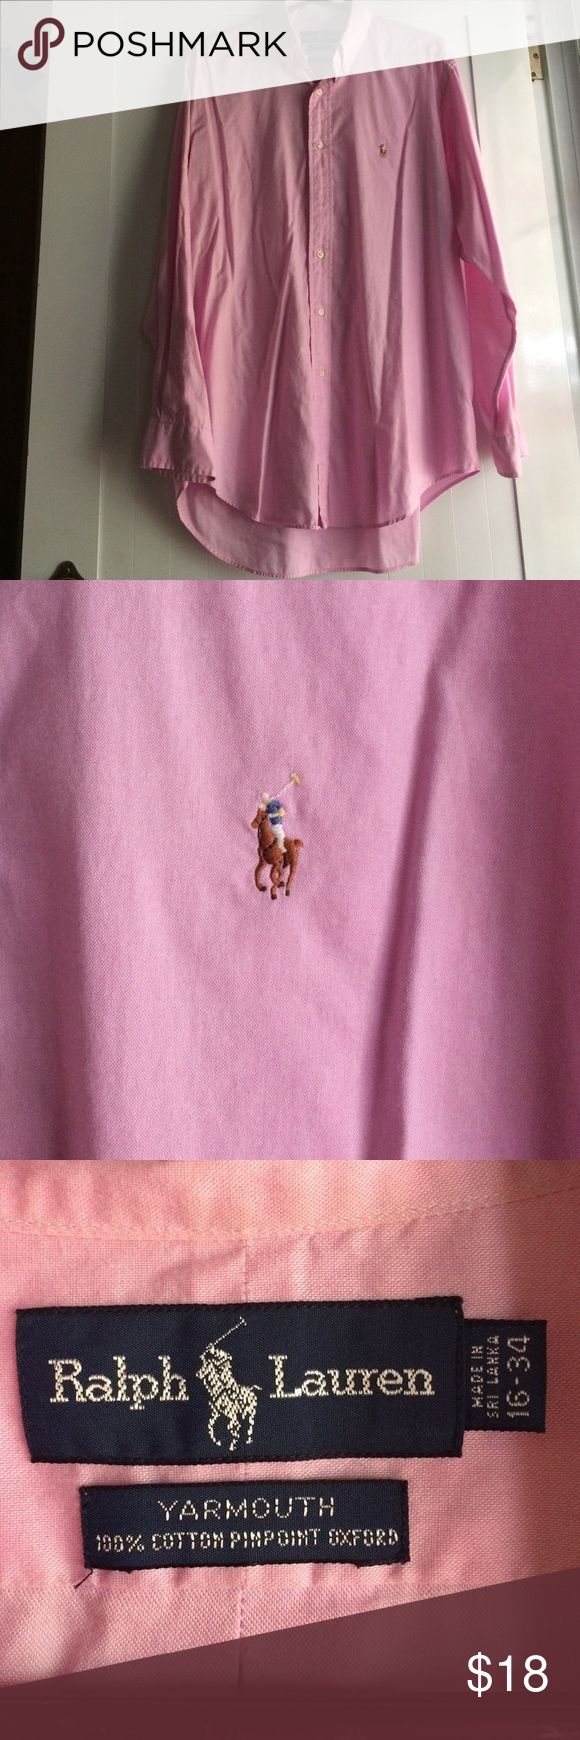 Polo Ralph Lauren men shirt Preowned men size 16/34 Polo Ralph Lauren button down shirt good conditions Polo by Ralph Lauren Shirts Dress Shirts